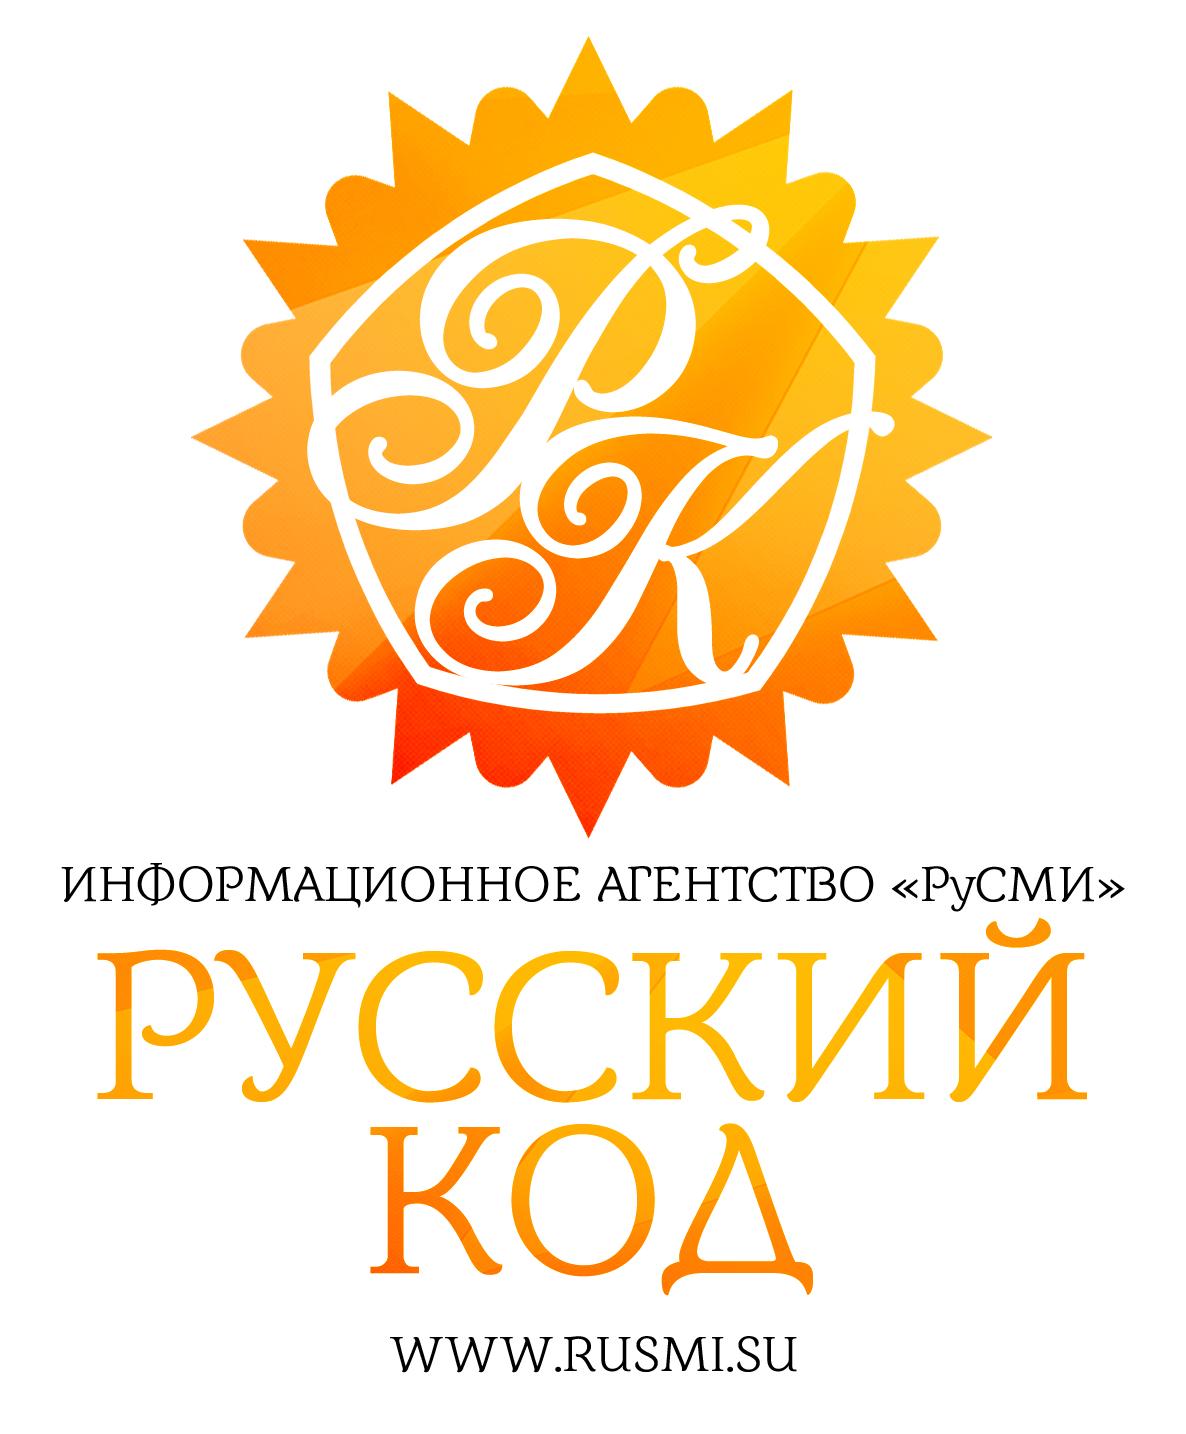 News Agency Russian media (Russian Code)